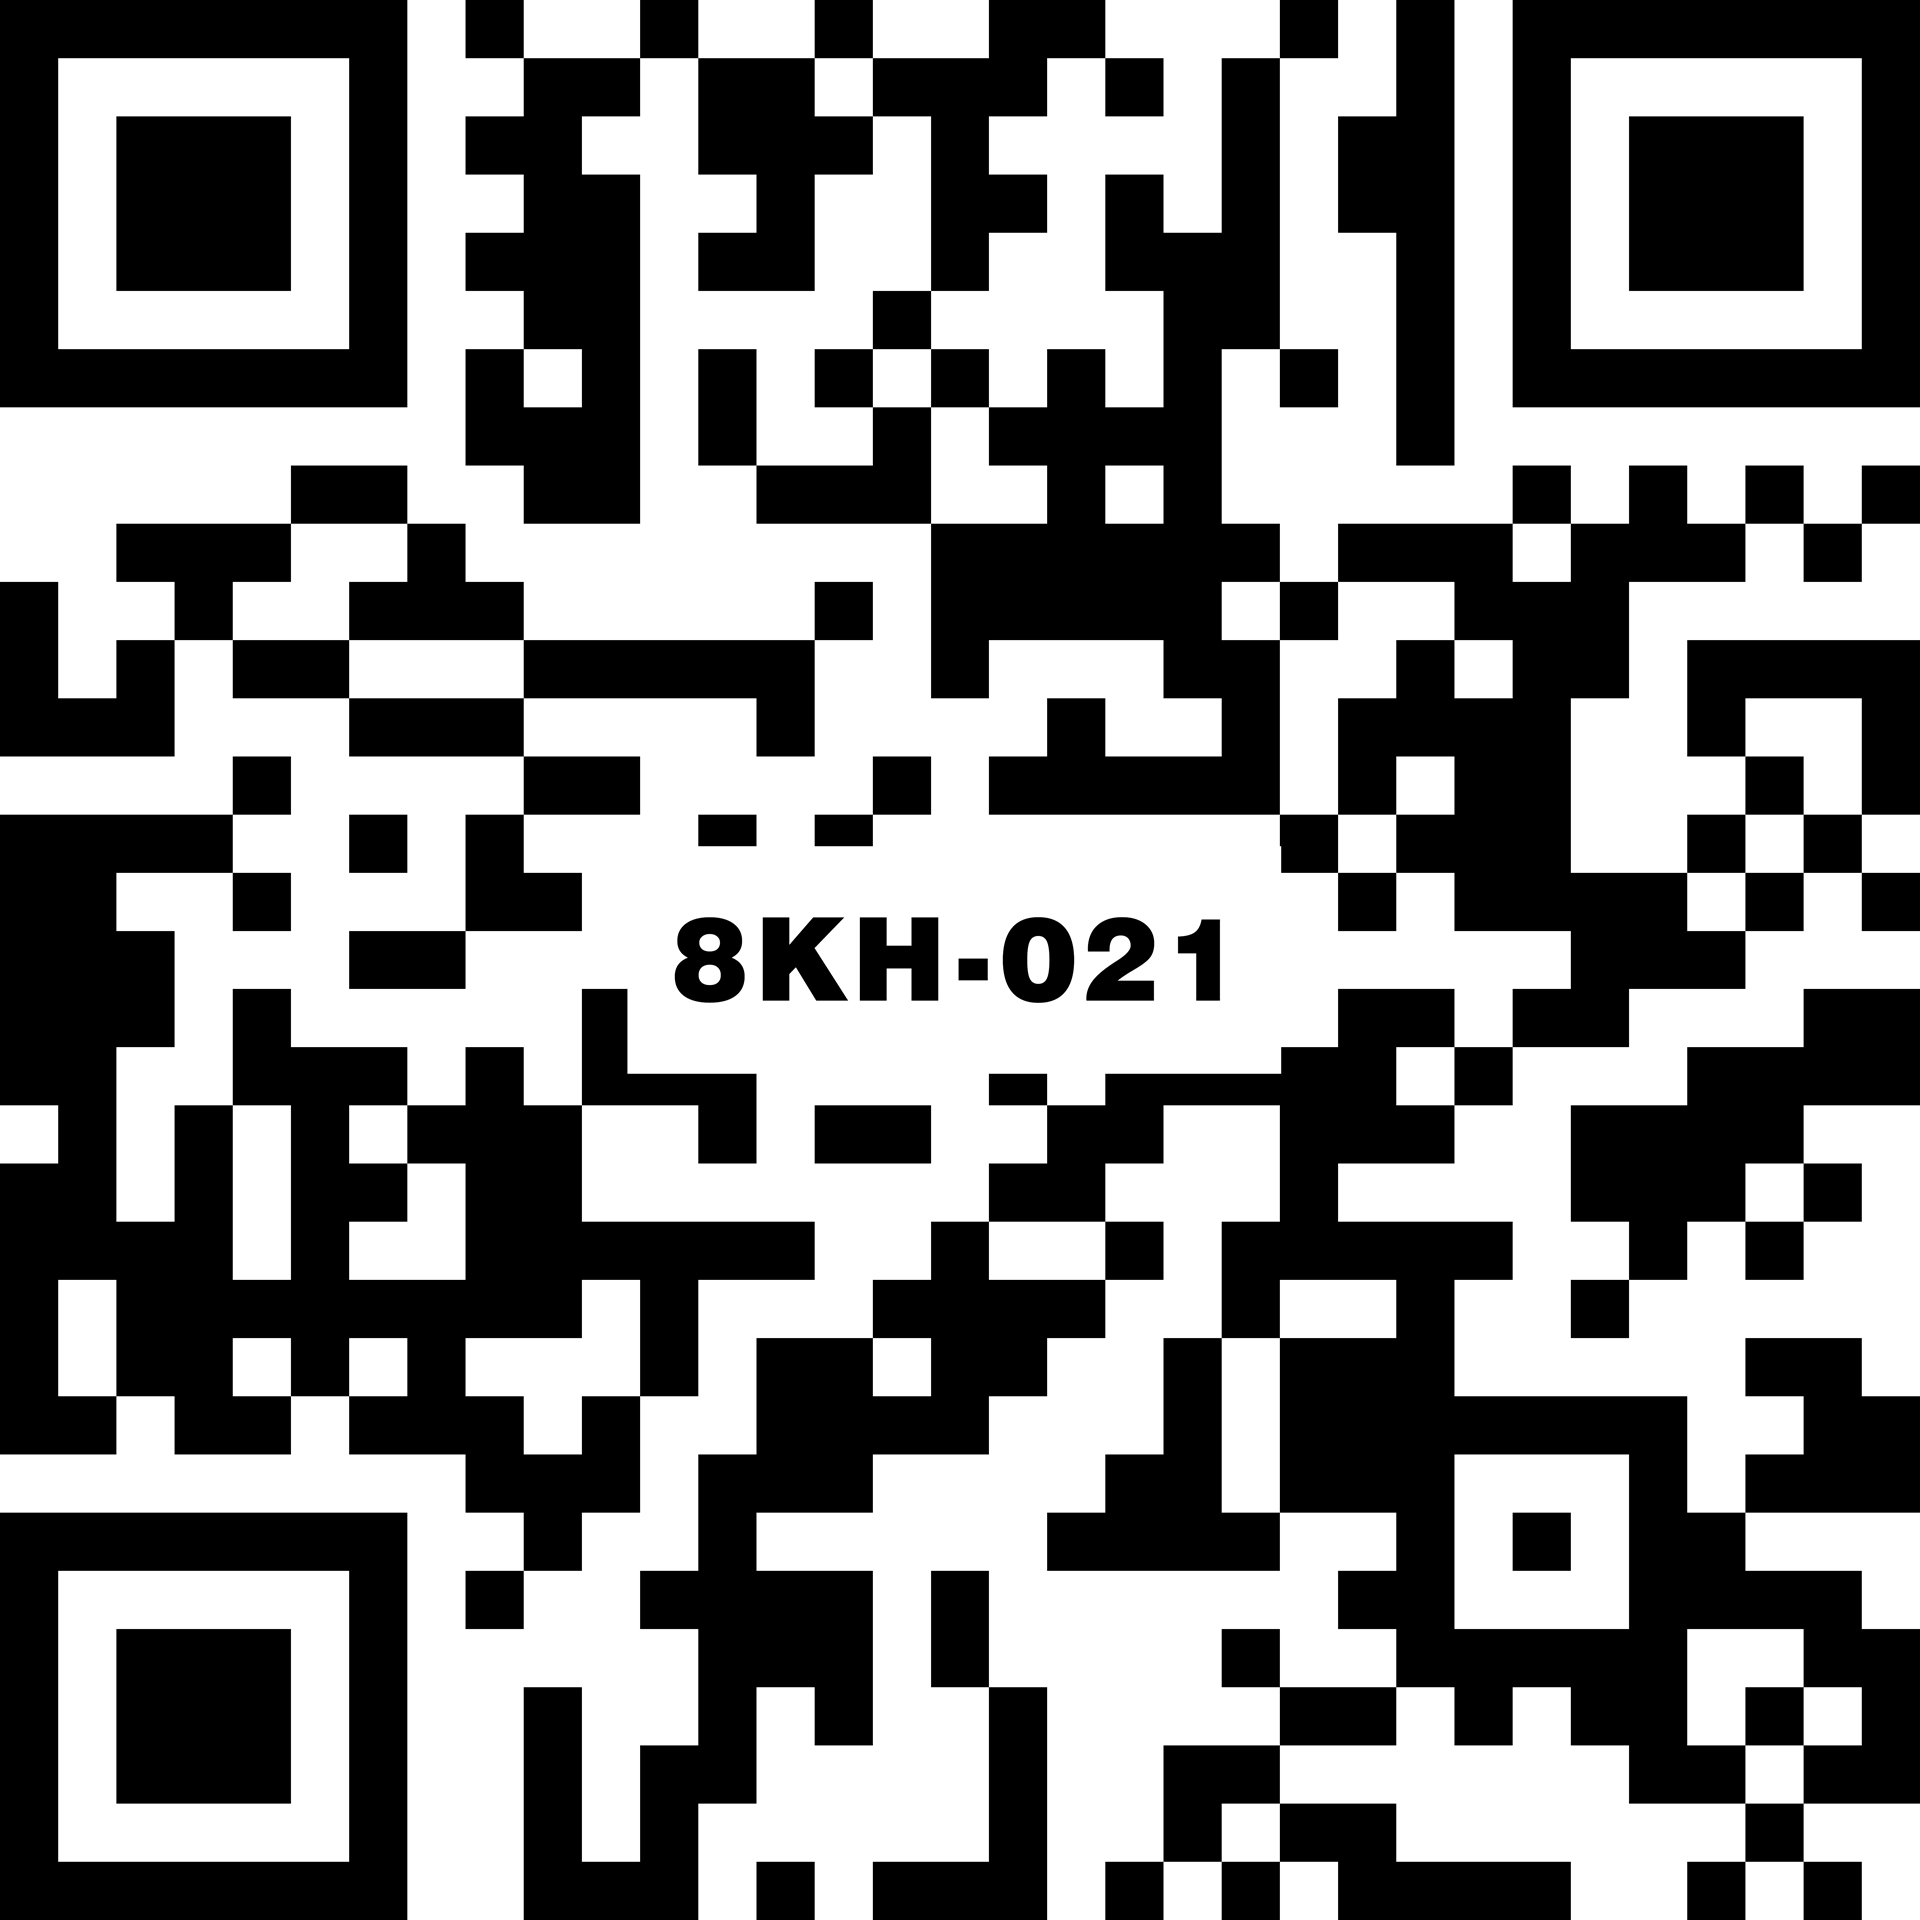 8KH-021